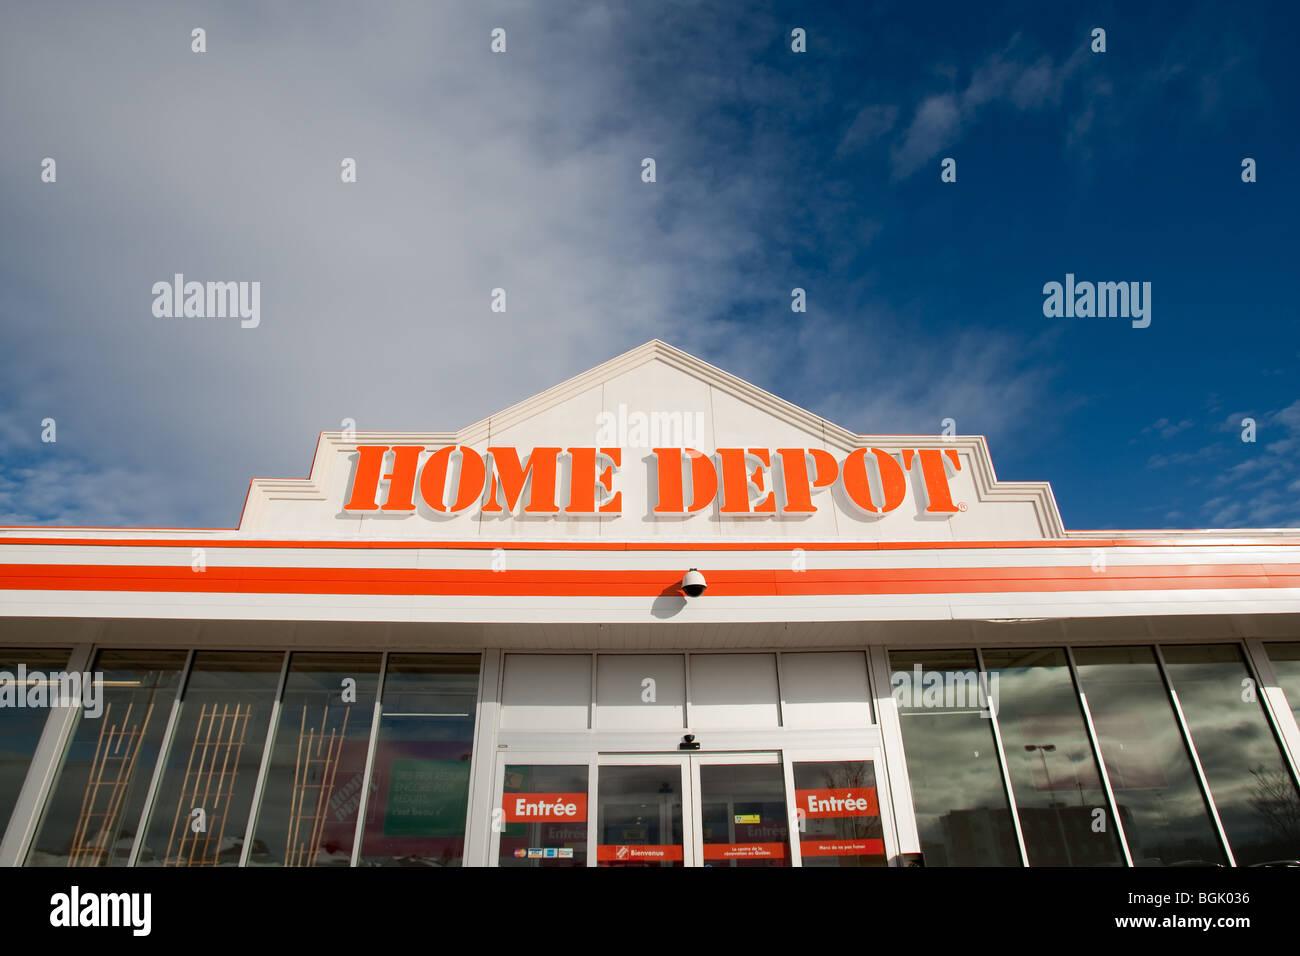 Abgebildet Ist Ein Home Depot Geschäft In Québec Stadt Stockfoto